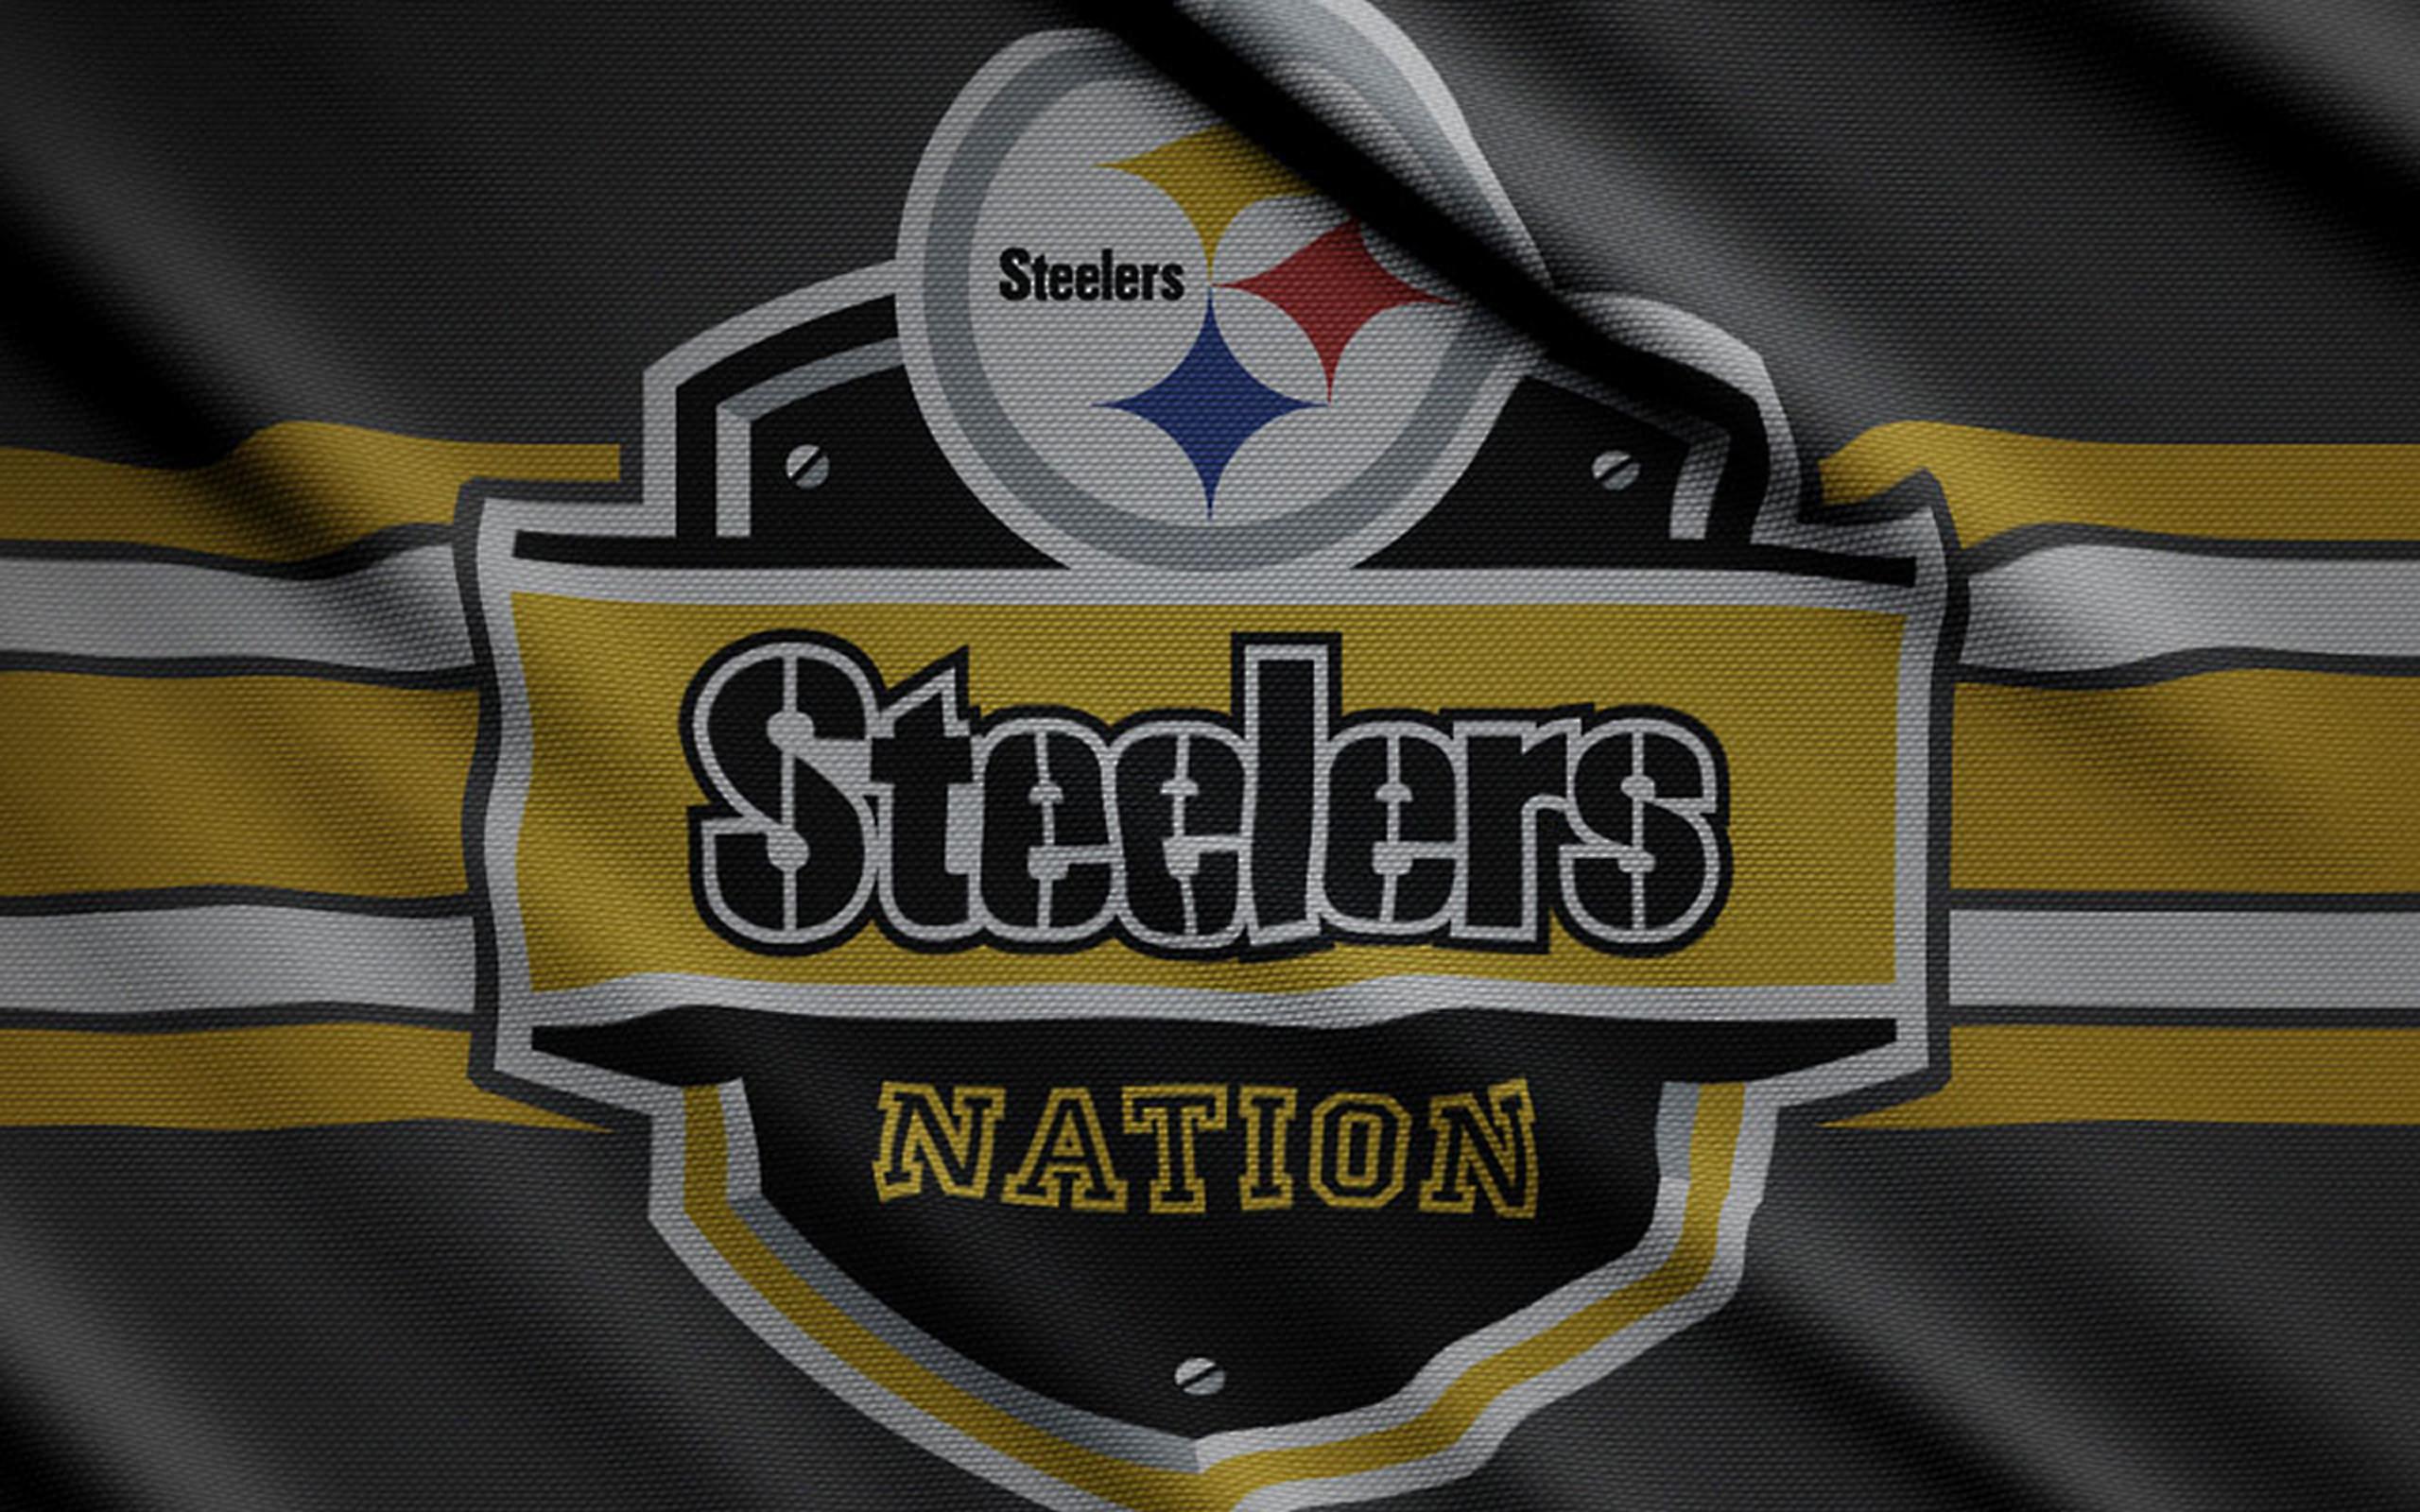 Steelers girl wallpapers 54 images 1920x1080 football nfl patriots pittsburgh steelers steelers nfl patriots vs steelers 2015 voltagebd Images